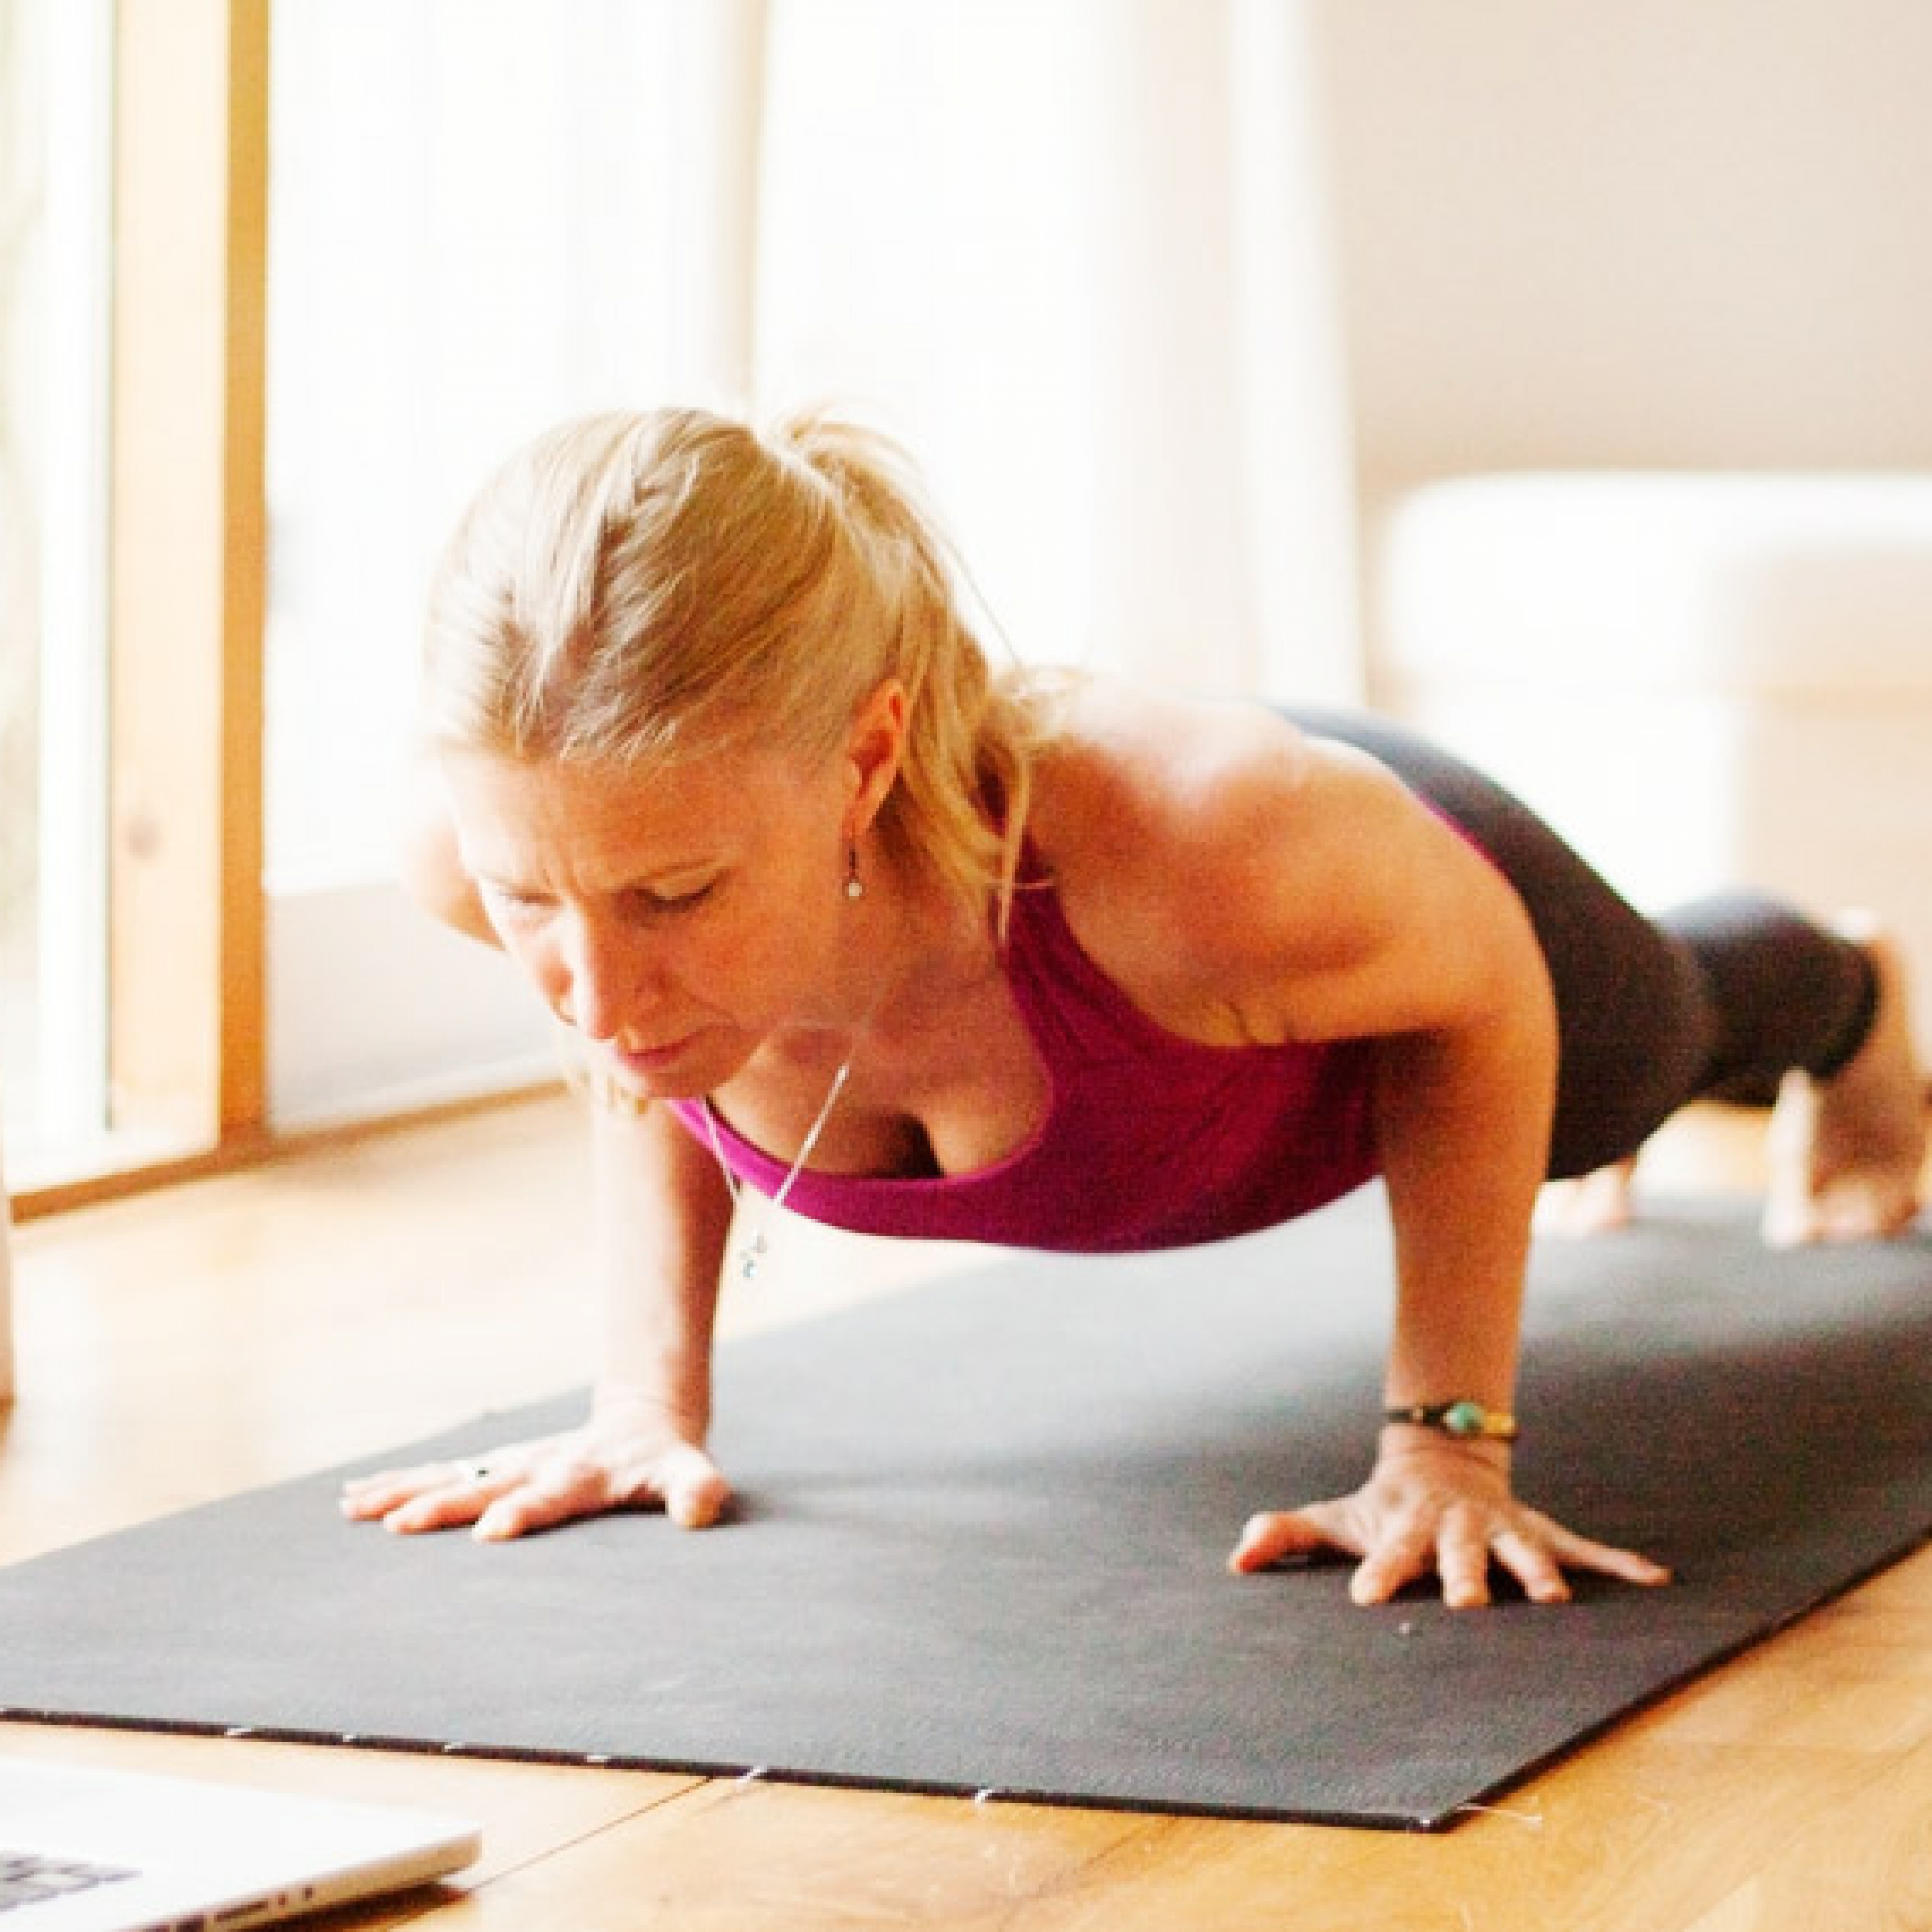 21 Mornings with Yoga - Season 2